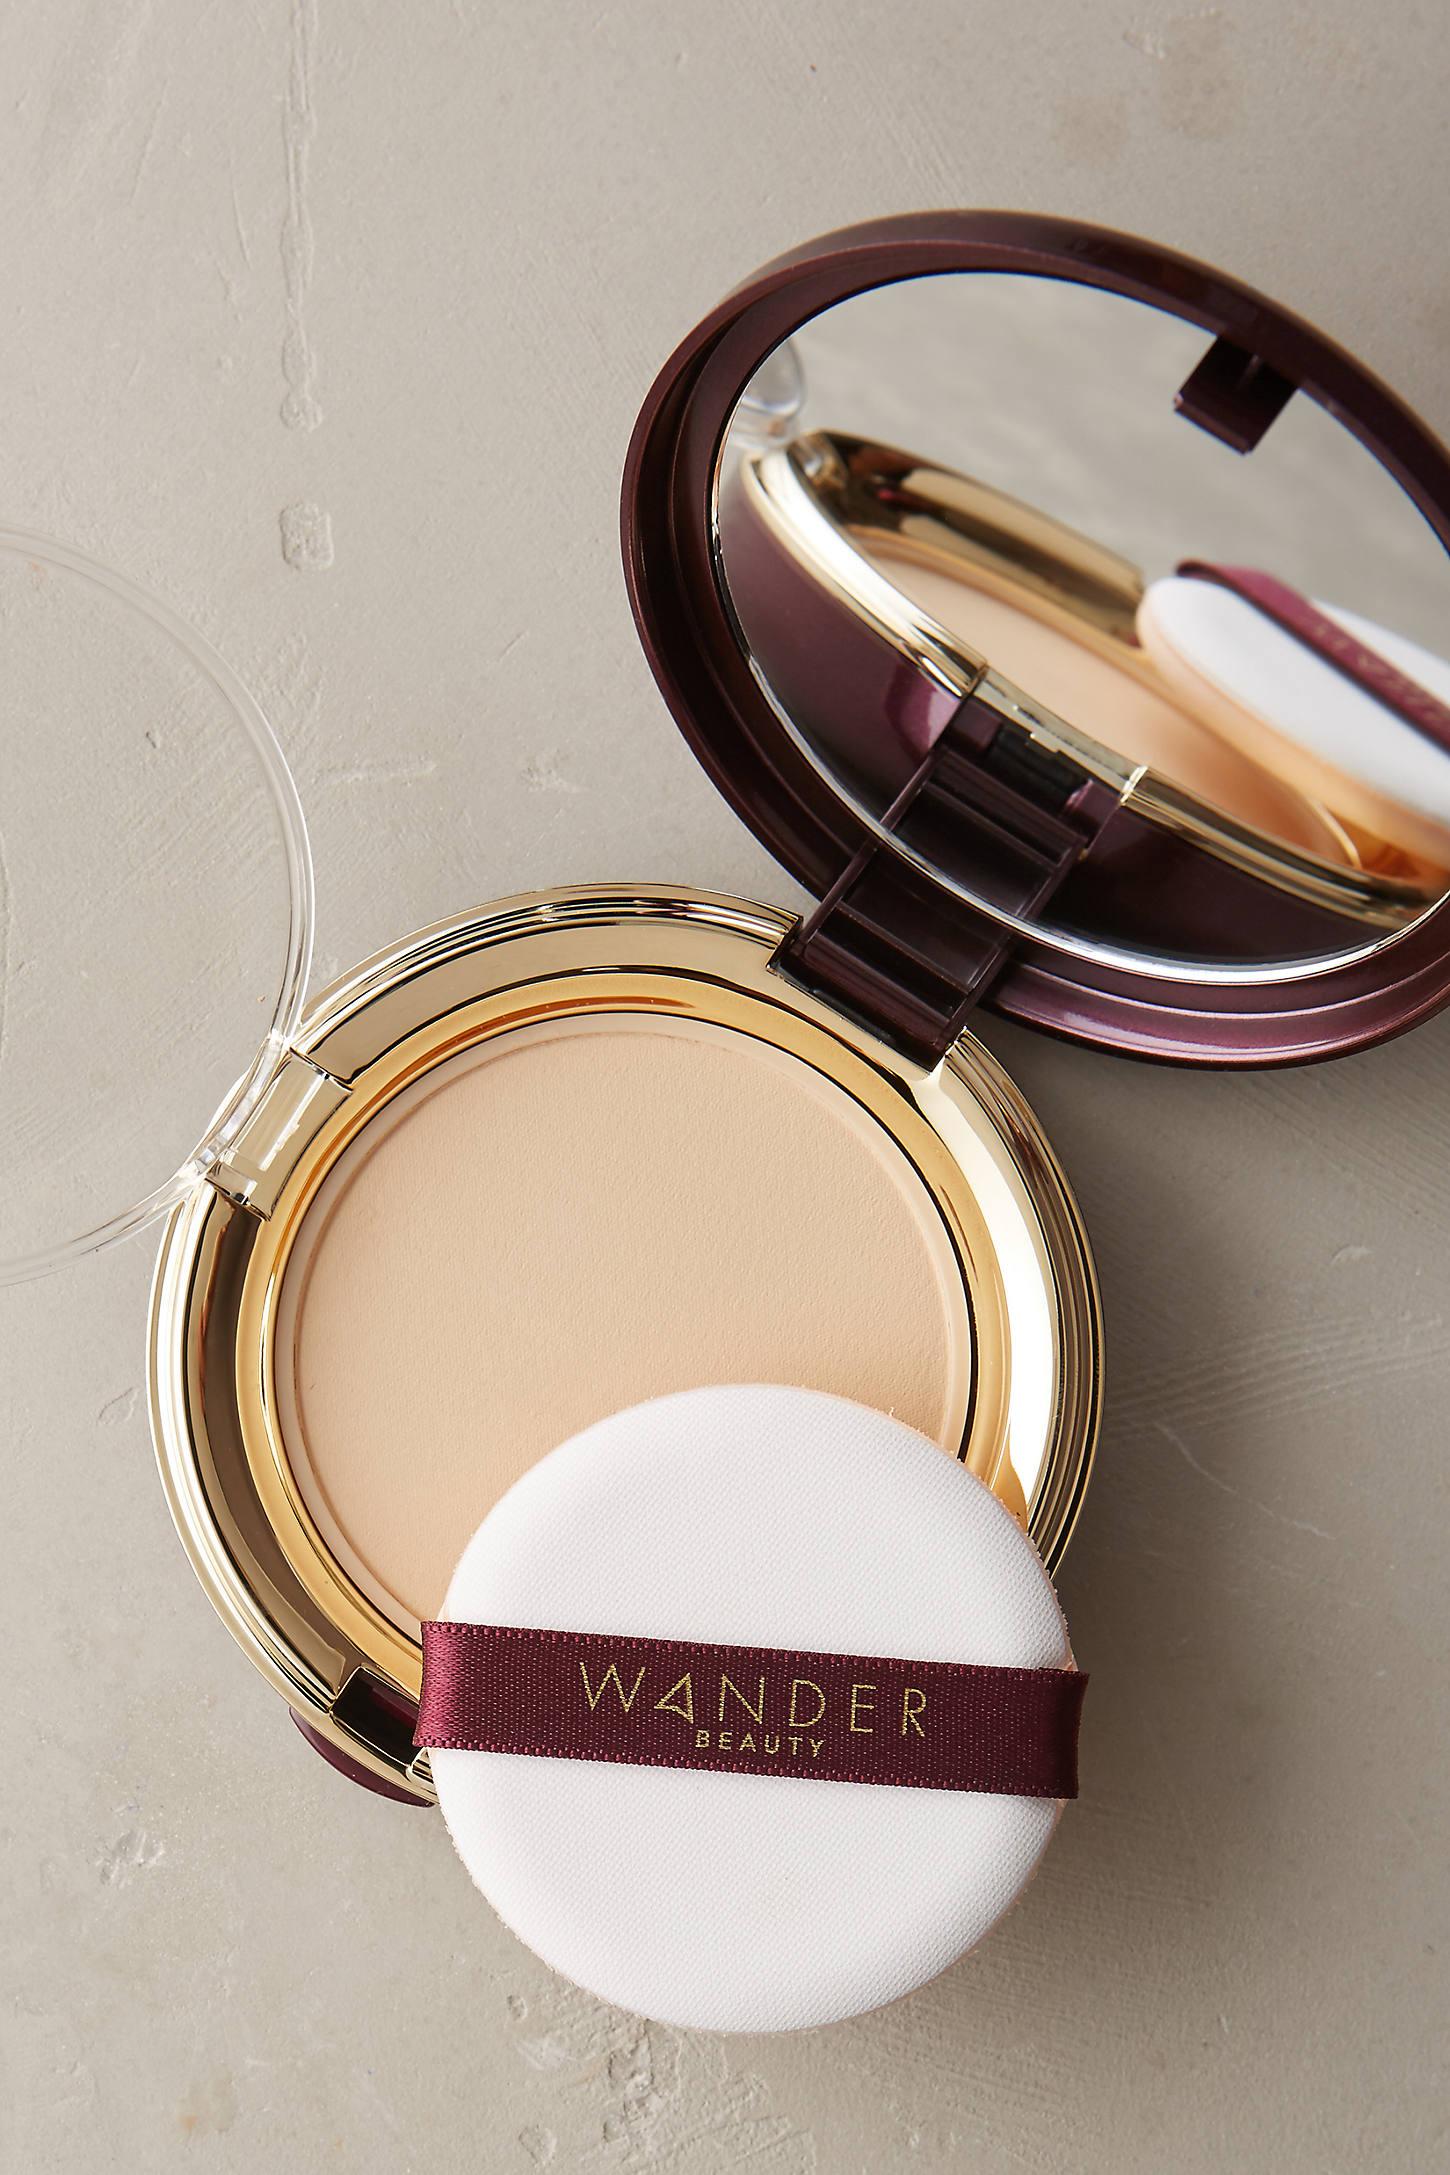 Wander Beauty Wanderlust Powder Foundation